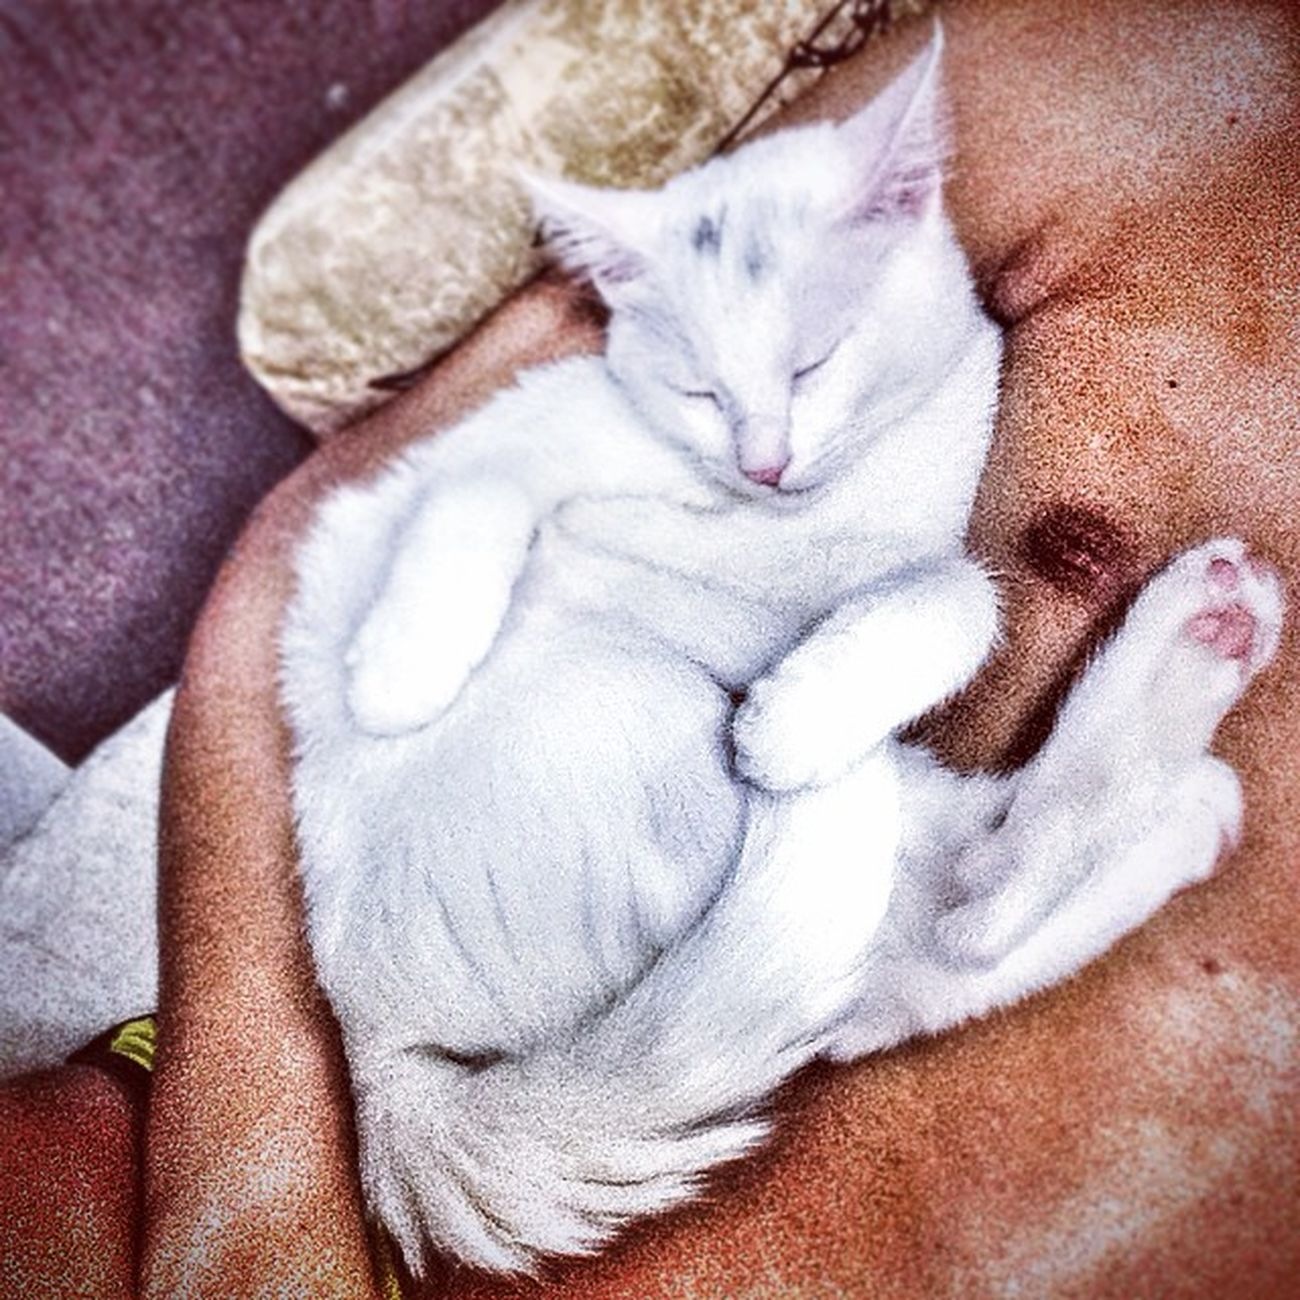 Hora de dormi! Evalima 4evertt Cat Pet gatobranco gato gatos whitecat